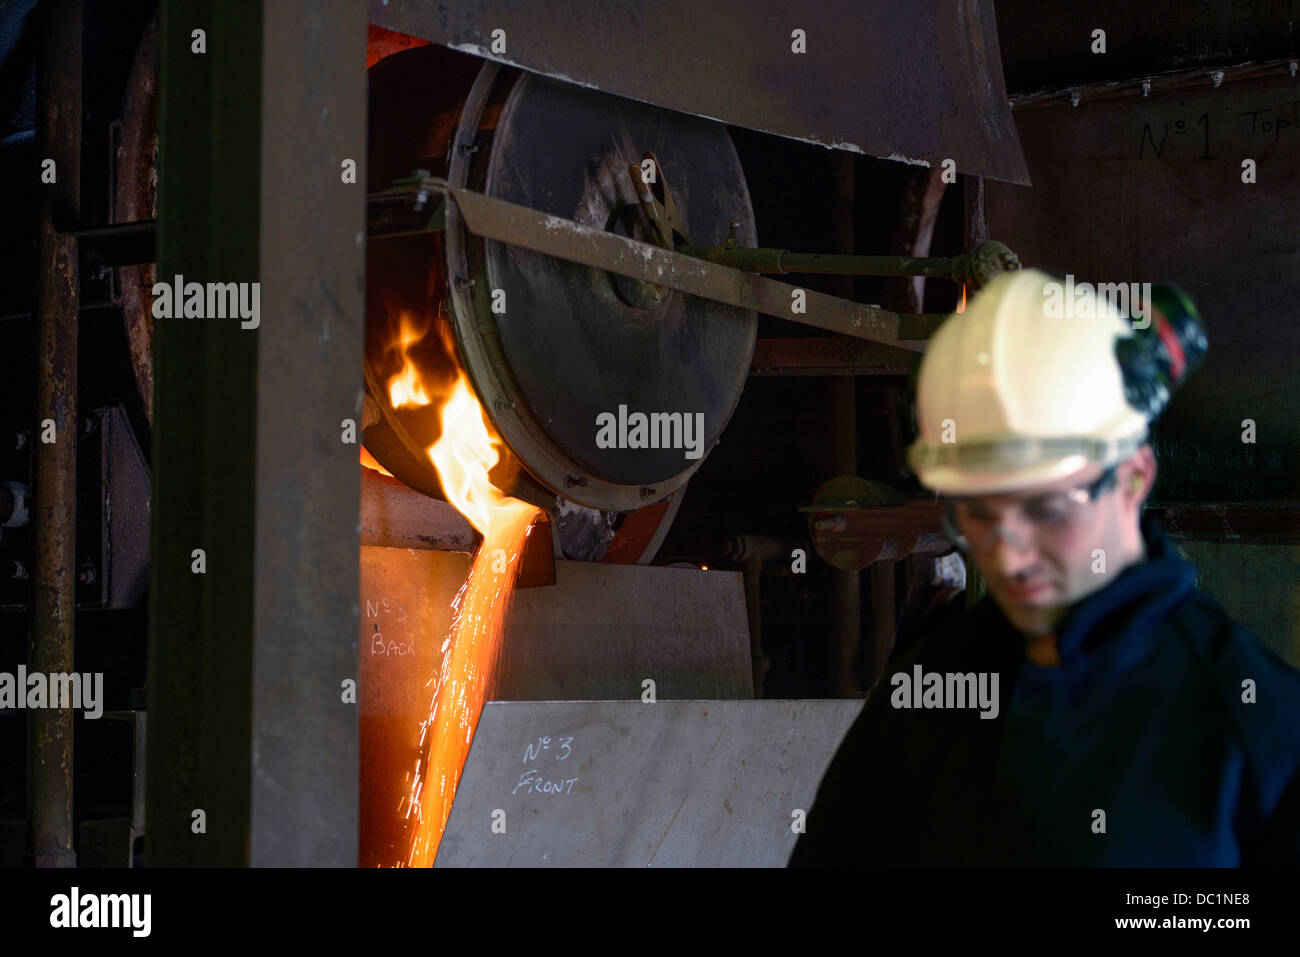 Steel worker in front of running molten metal in steel foundry Stock Photo